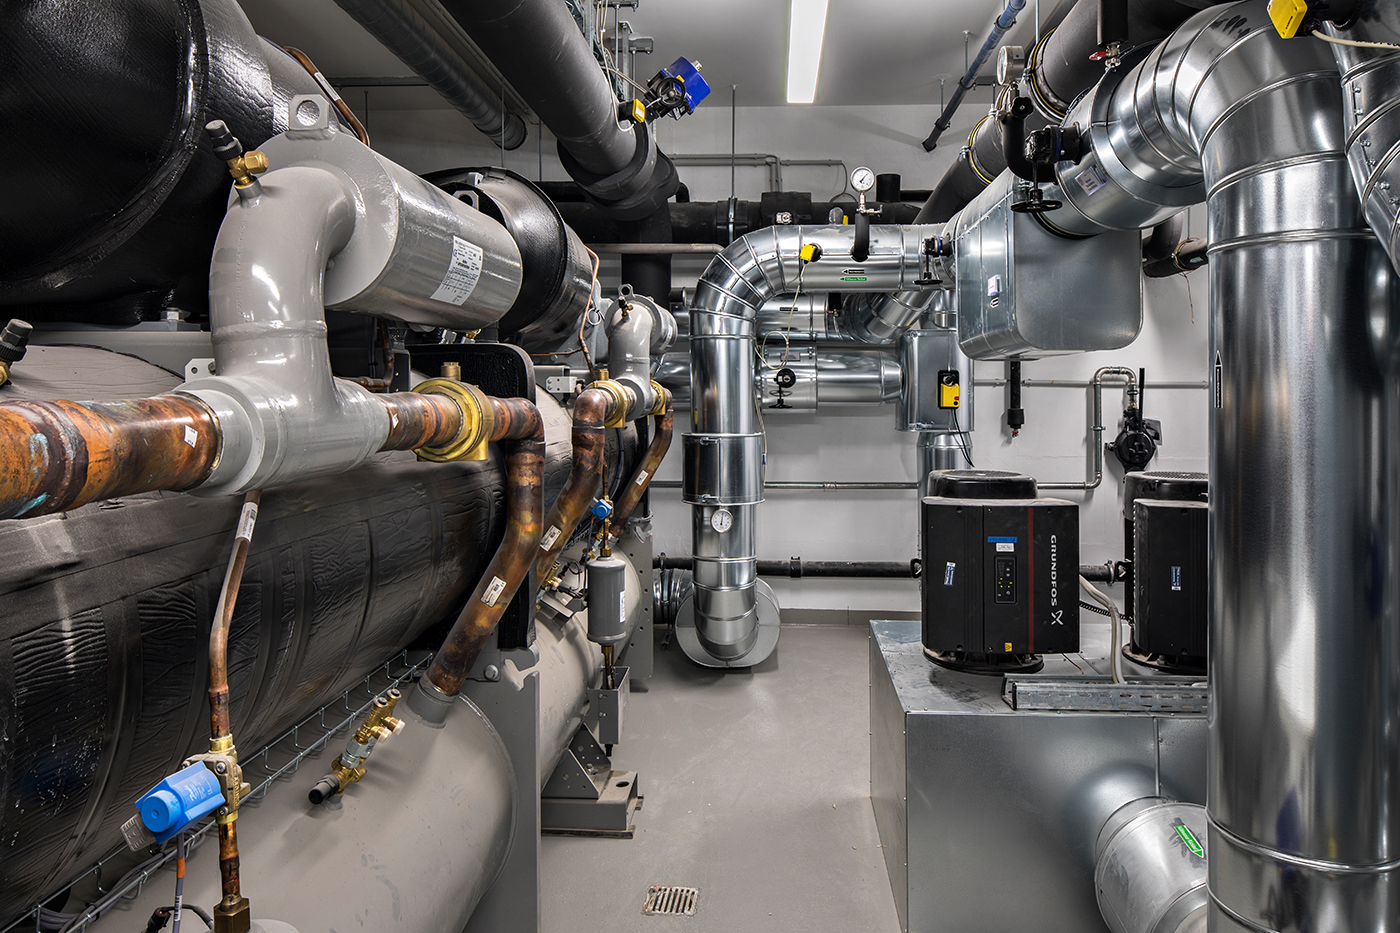 Kältezentrale - Kältemaschine ca. 1,2 MW